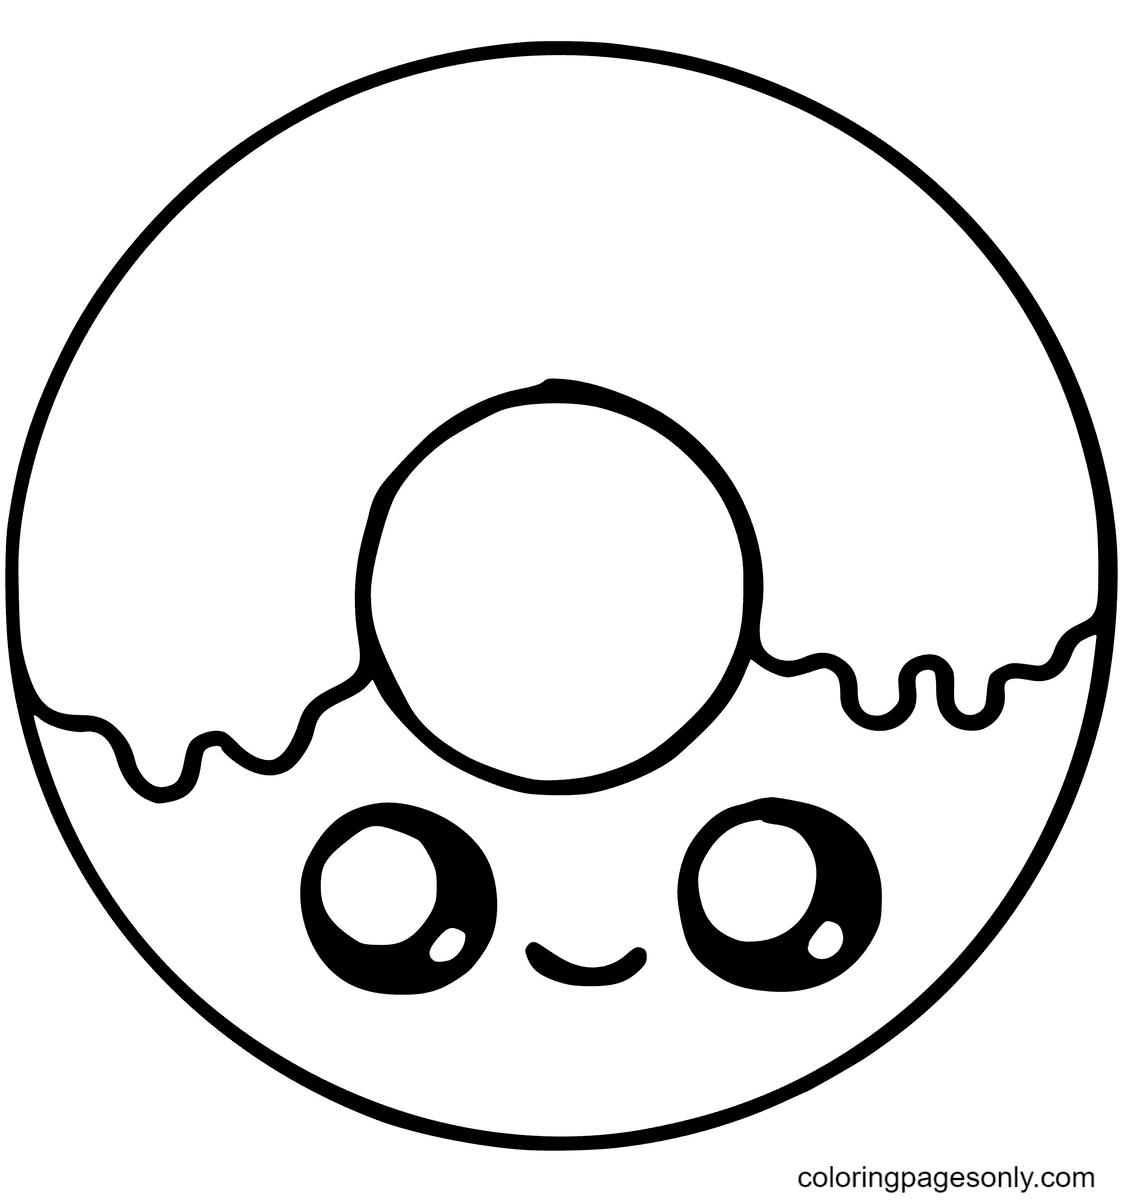 Cute Donut with Sugar Kawaii Coloring Page